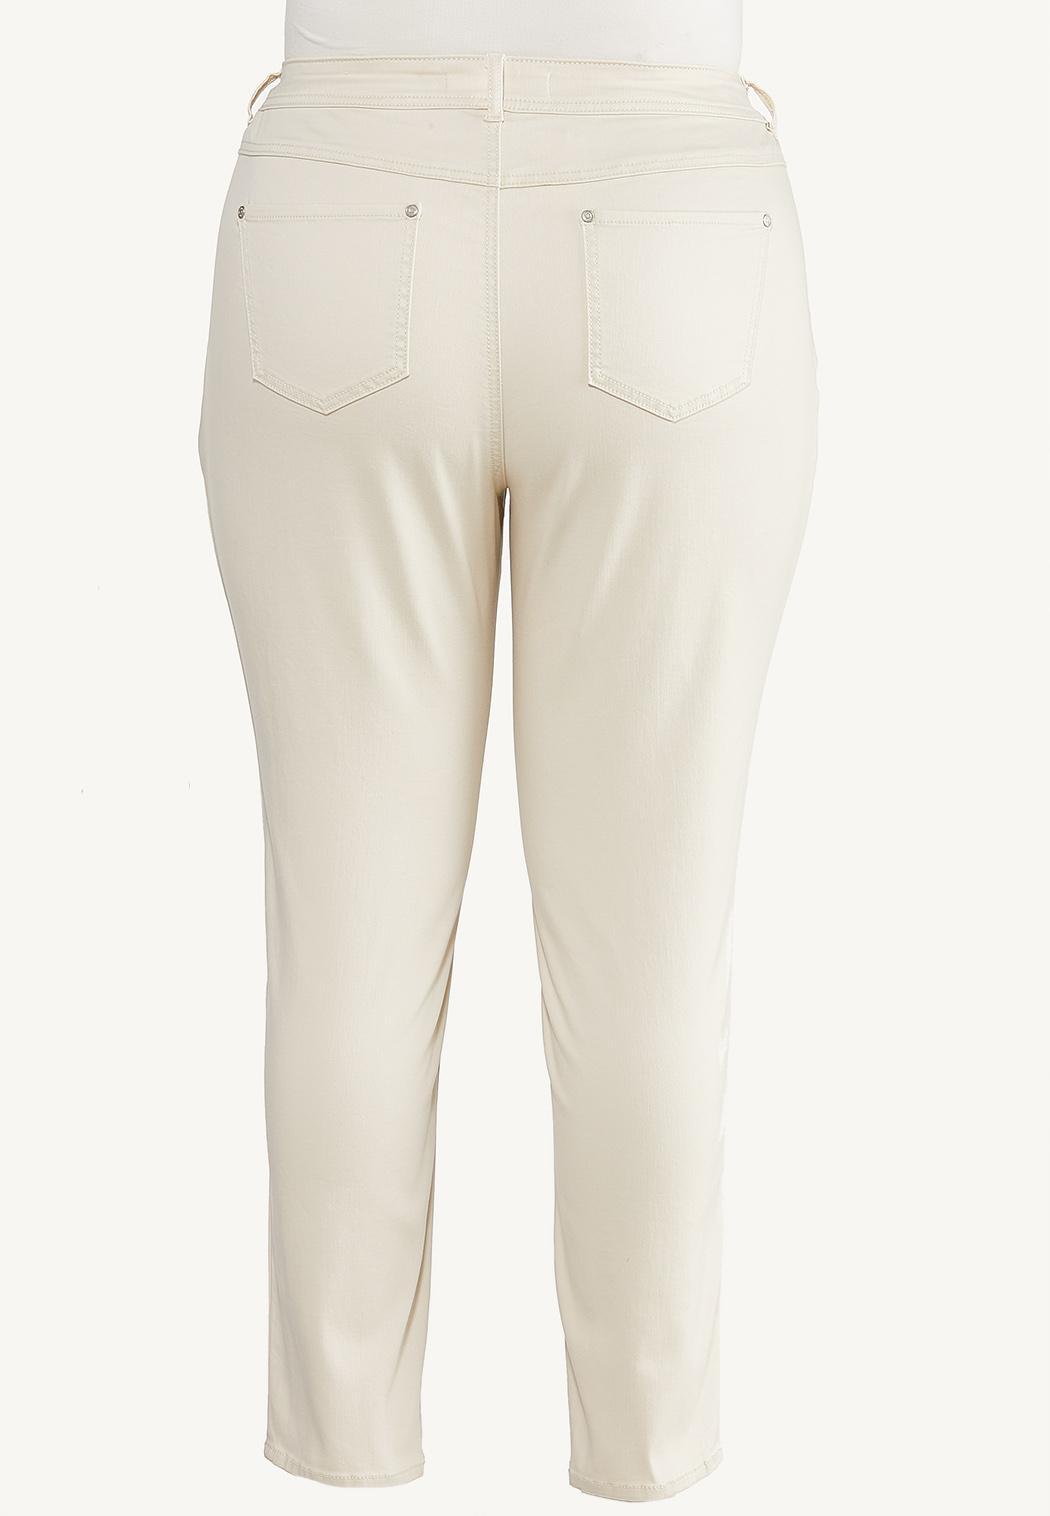 Plus Size Neutral Skinny Jeans (Item #44664942)